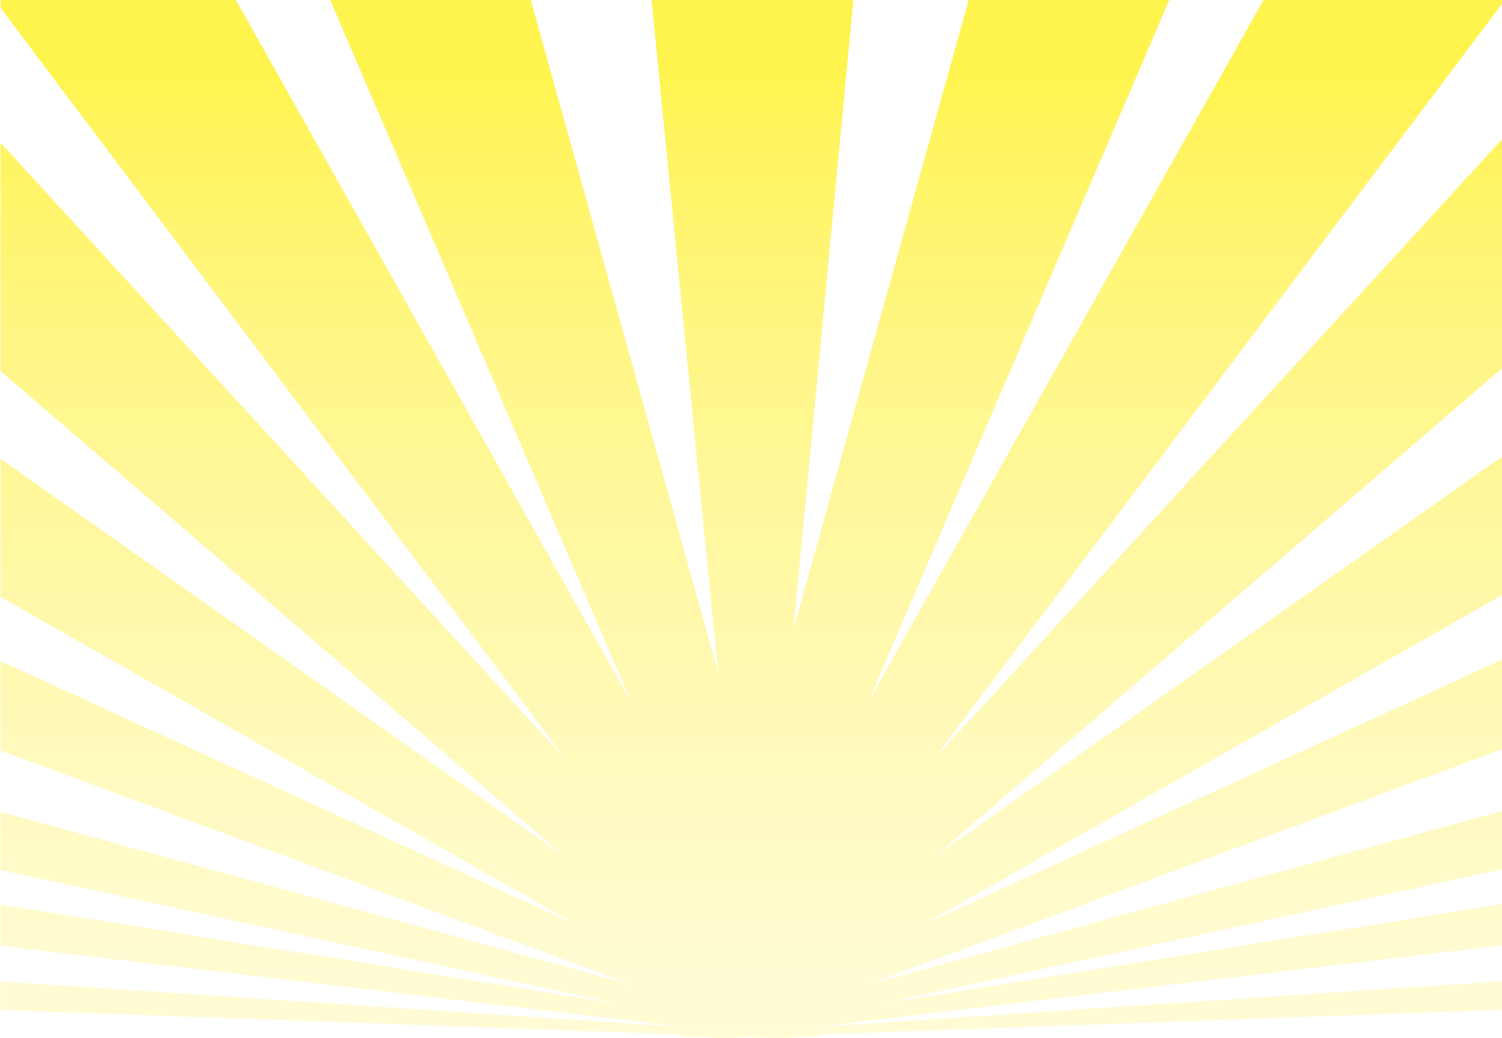 make a 16x16 icon vGHlaXP